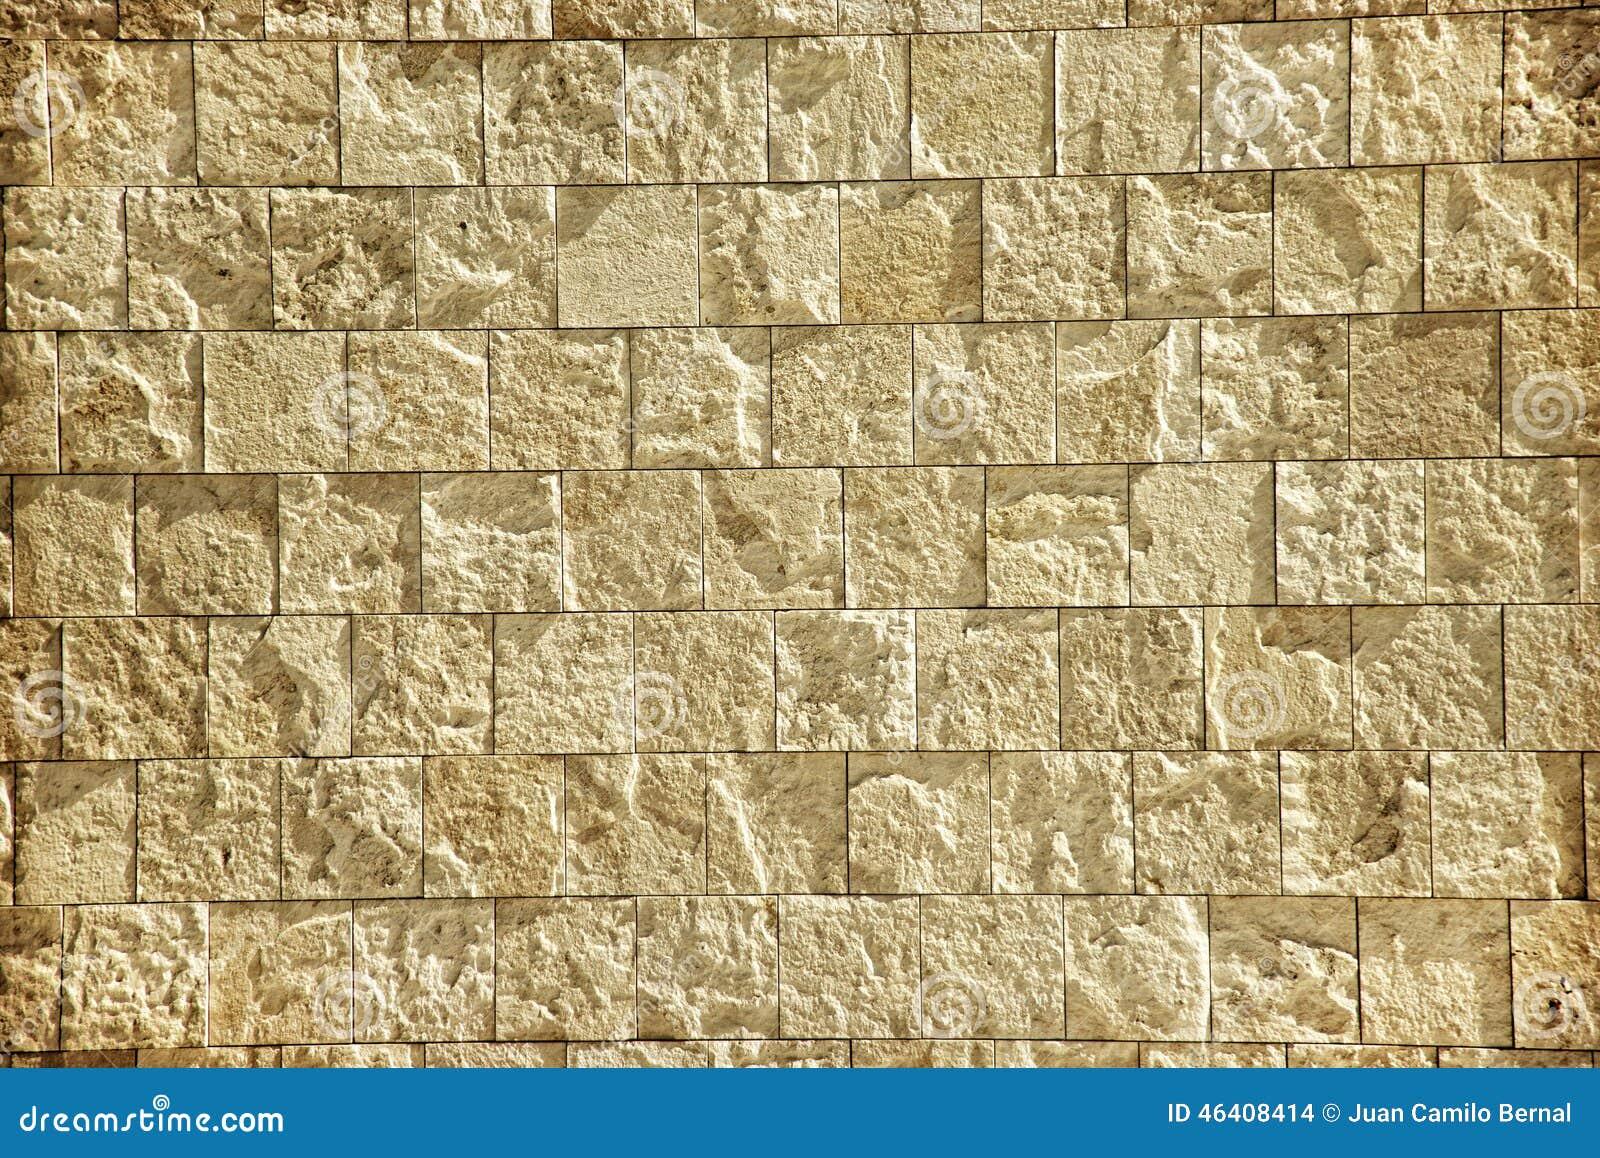 Background brick wall stock photo. Image of slate, facade - 46408414